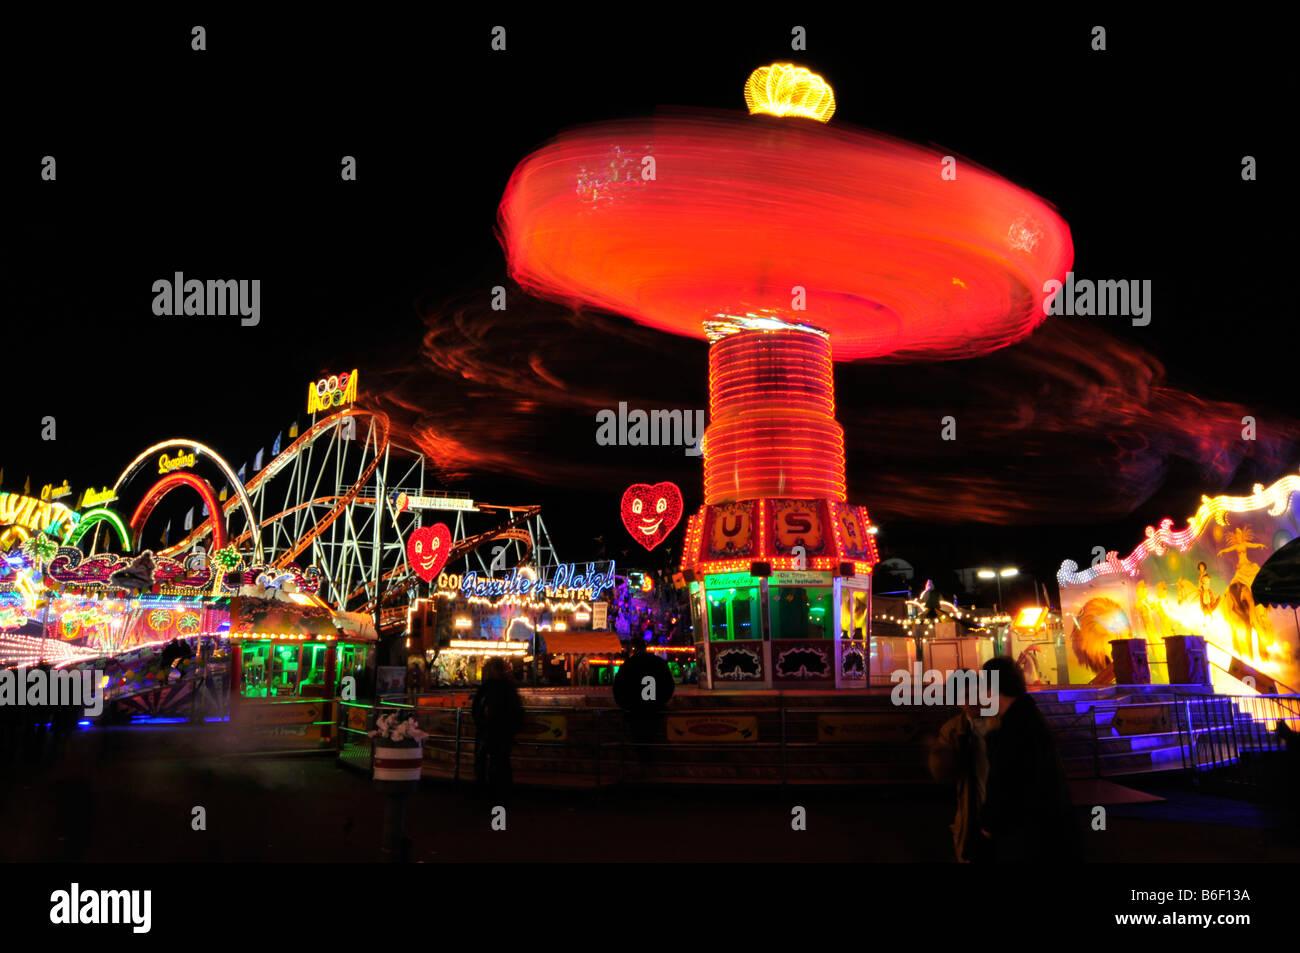 Chain carousel at night, Oktoberfest, Munich, Bavaria, Germany, Europe Stock Photo